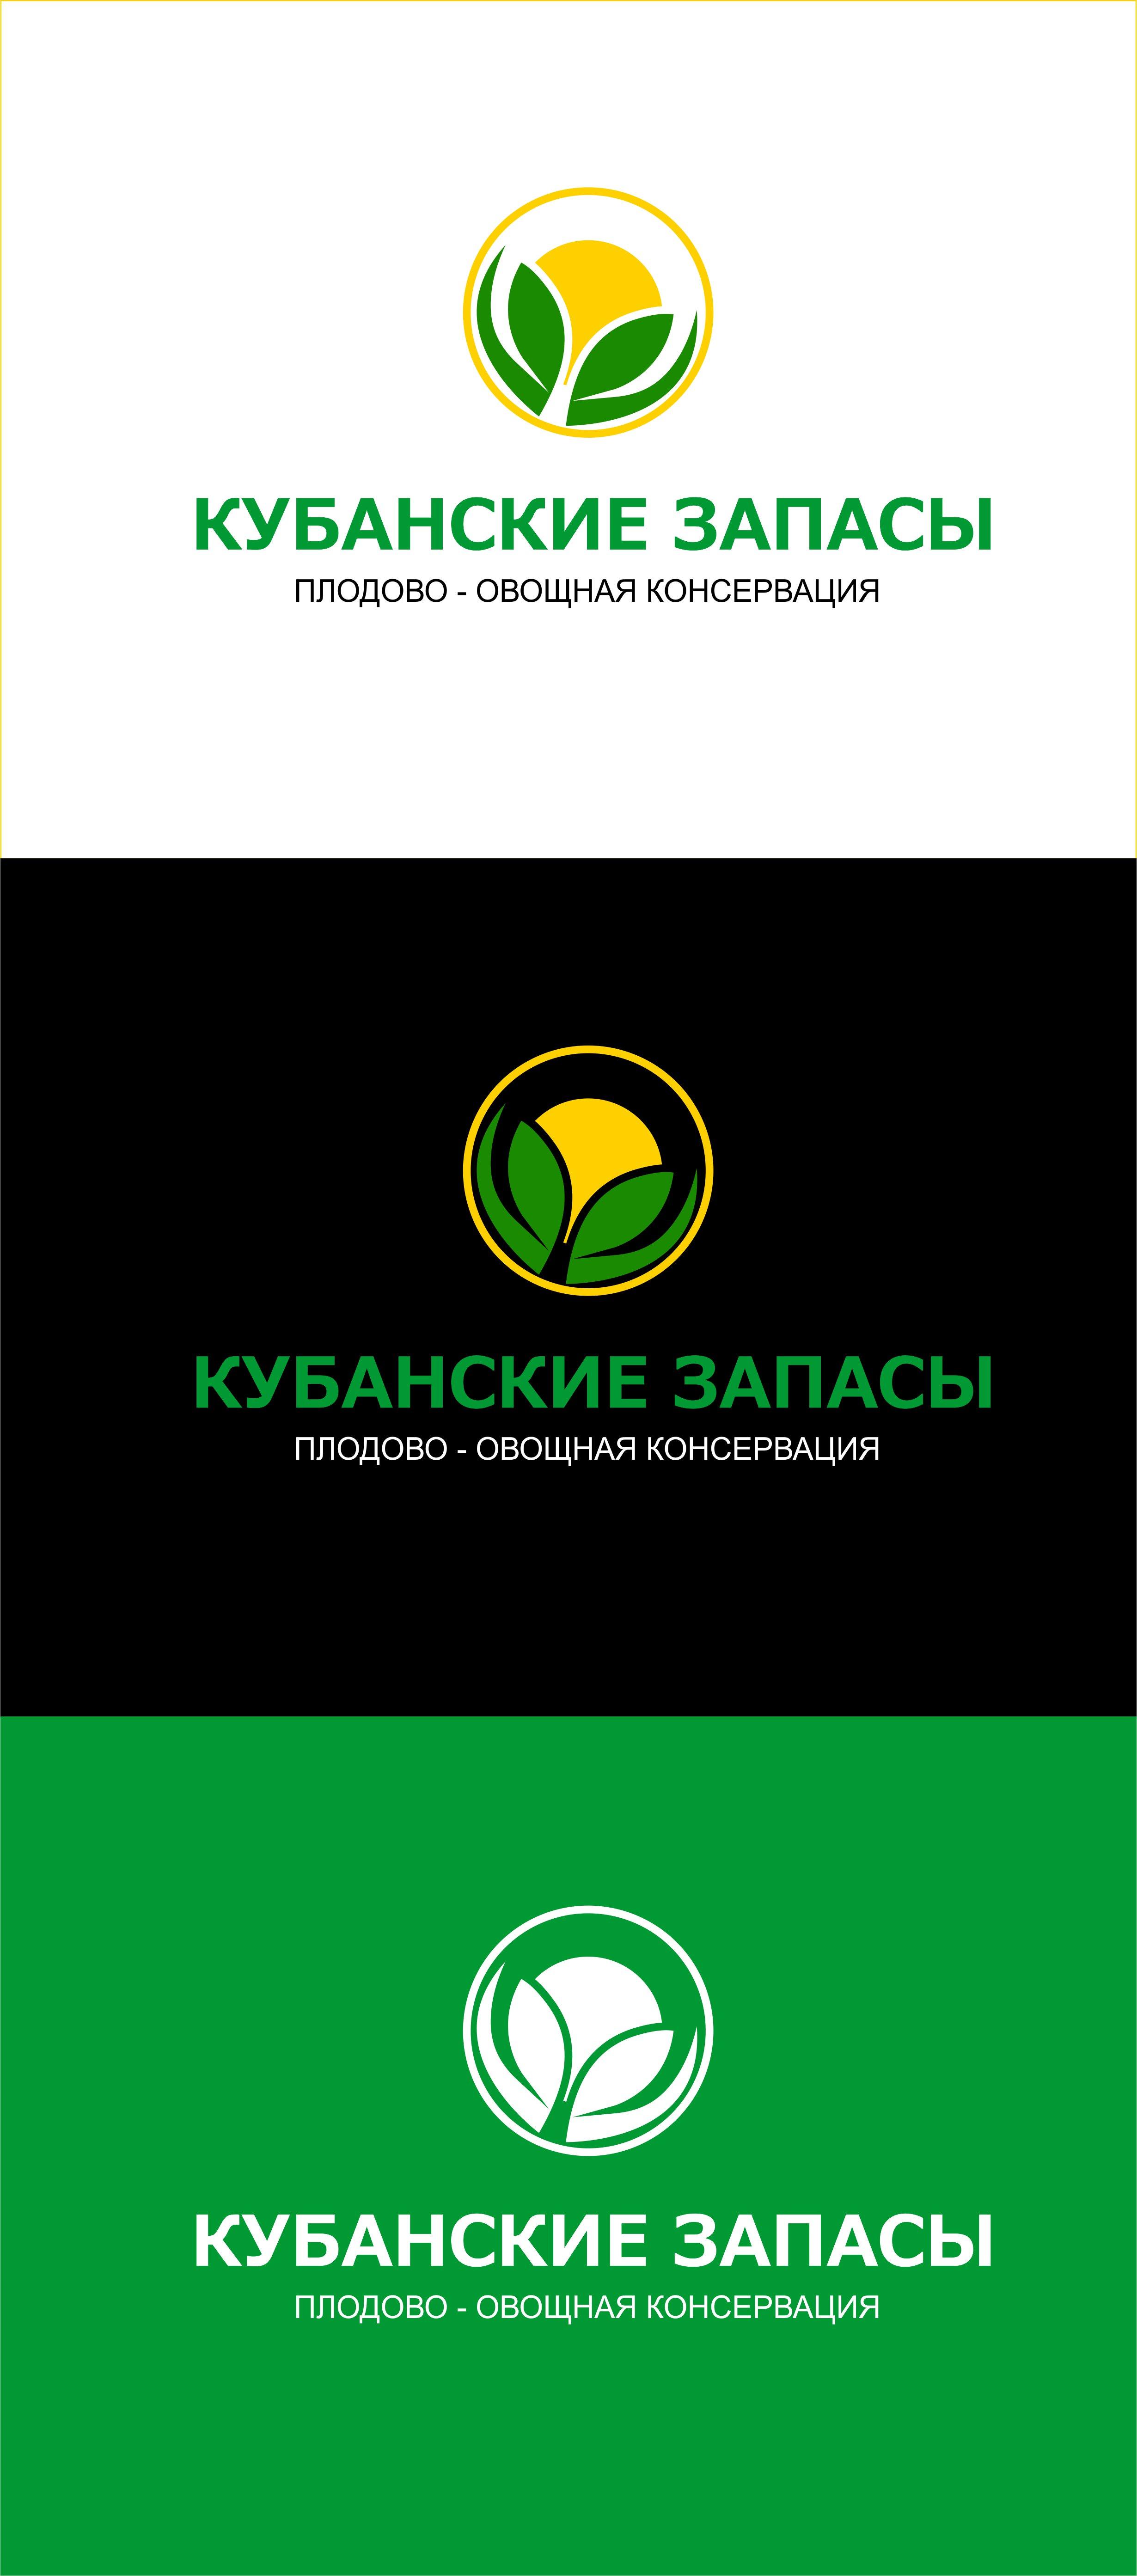 Логотип, фирменный стиль фото f_9645de69a47bcf6e.jpg